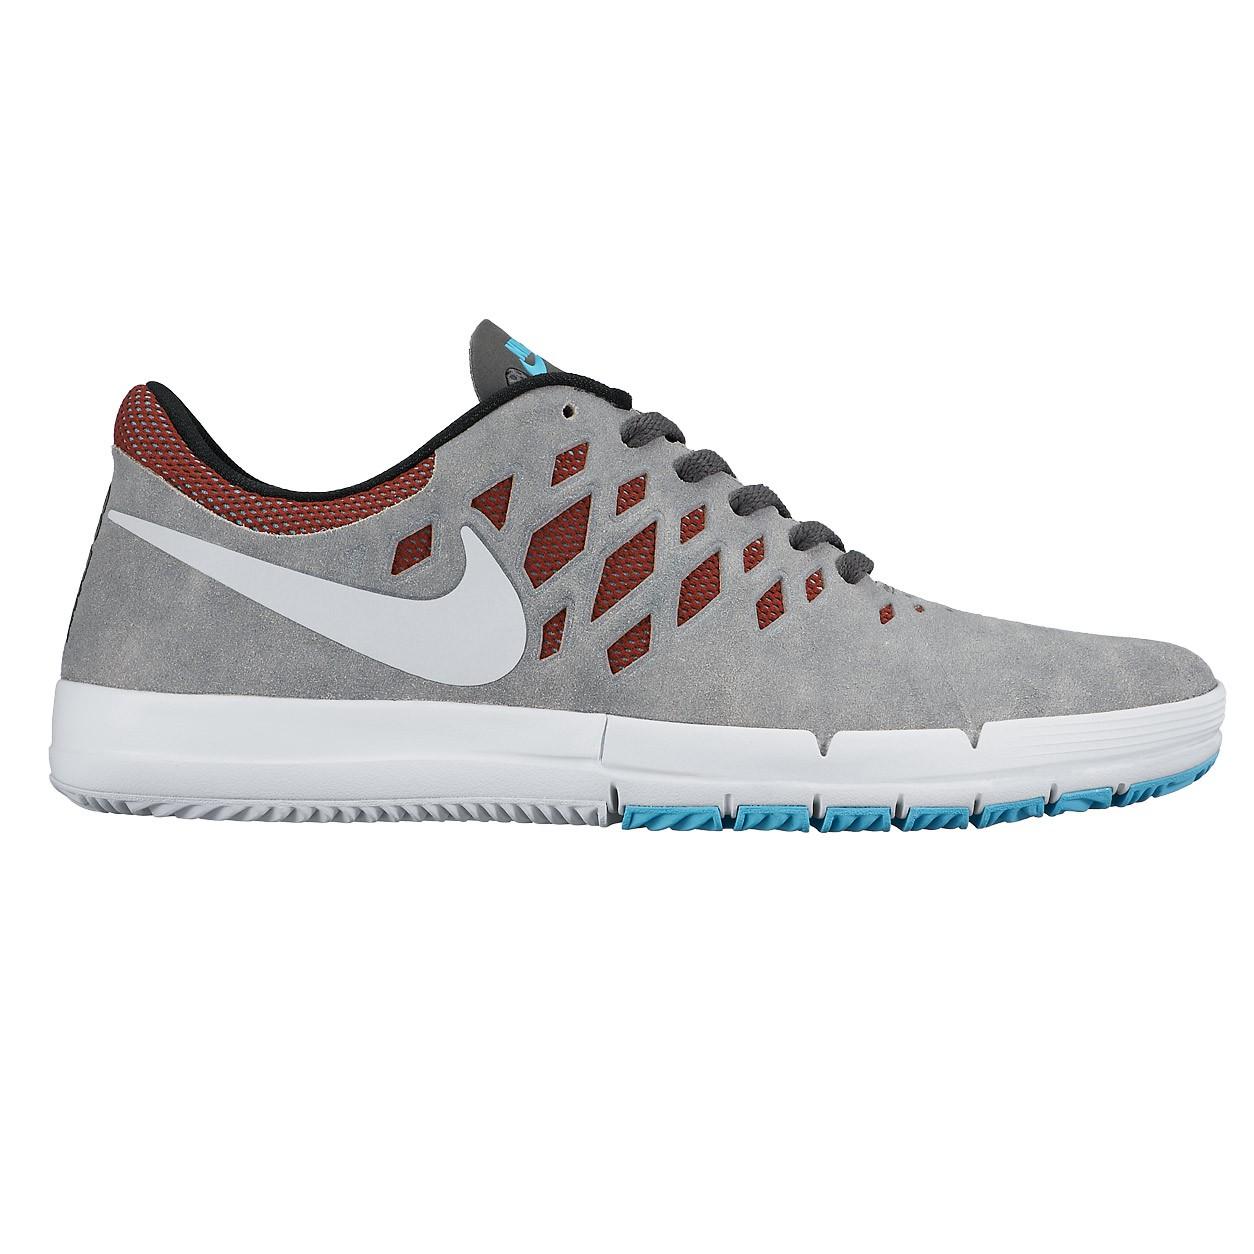 5206a44e5f736 Nike SB Free Sb dark grey white-team red-black